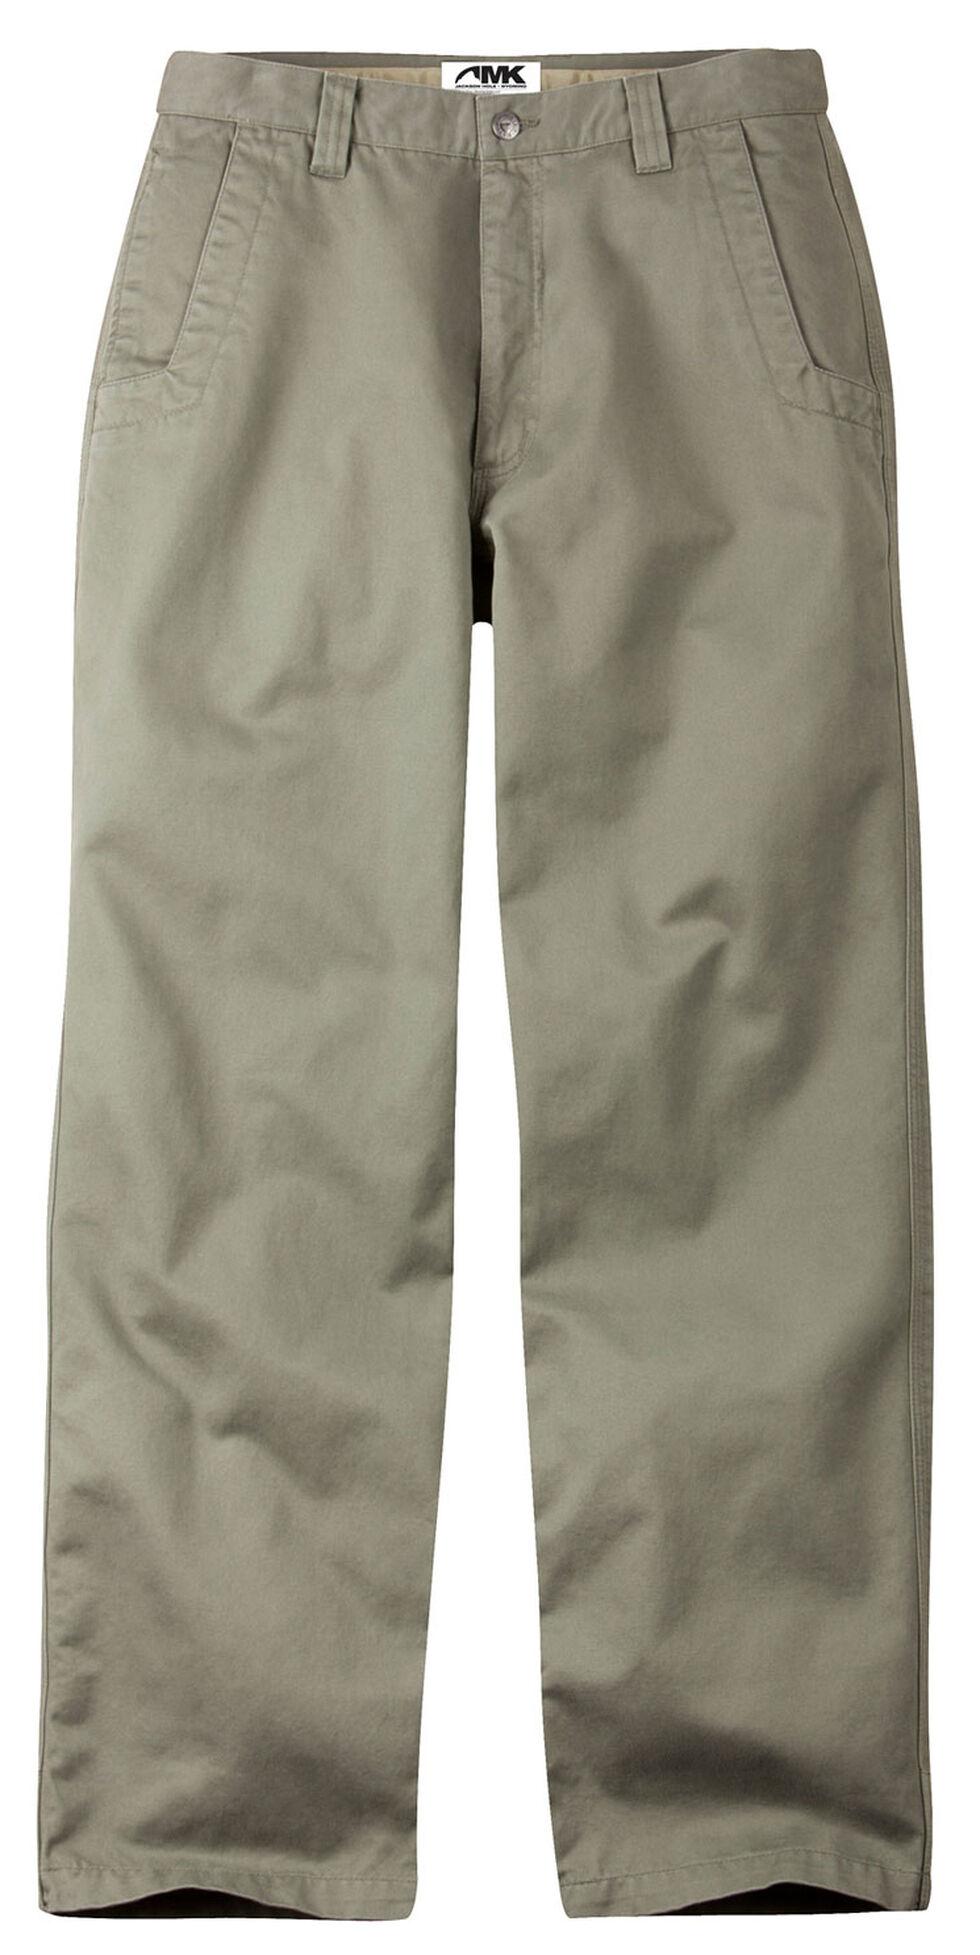 Mountain Khakis Men's Olive Teton Relaxed Fit Pants, Olive, hi-res